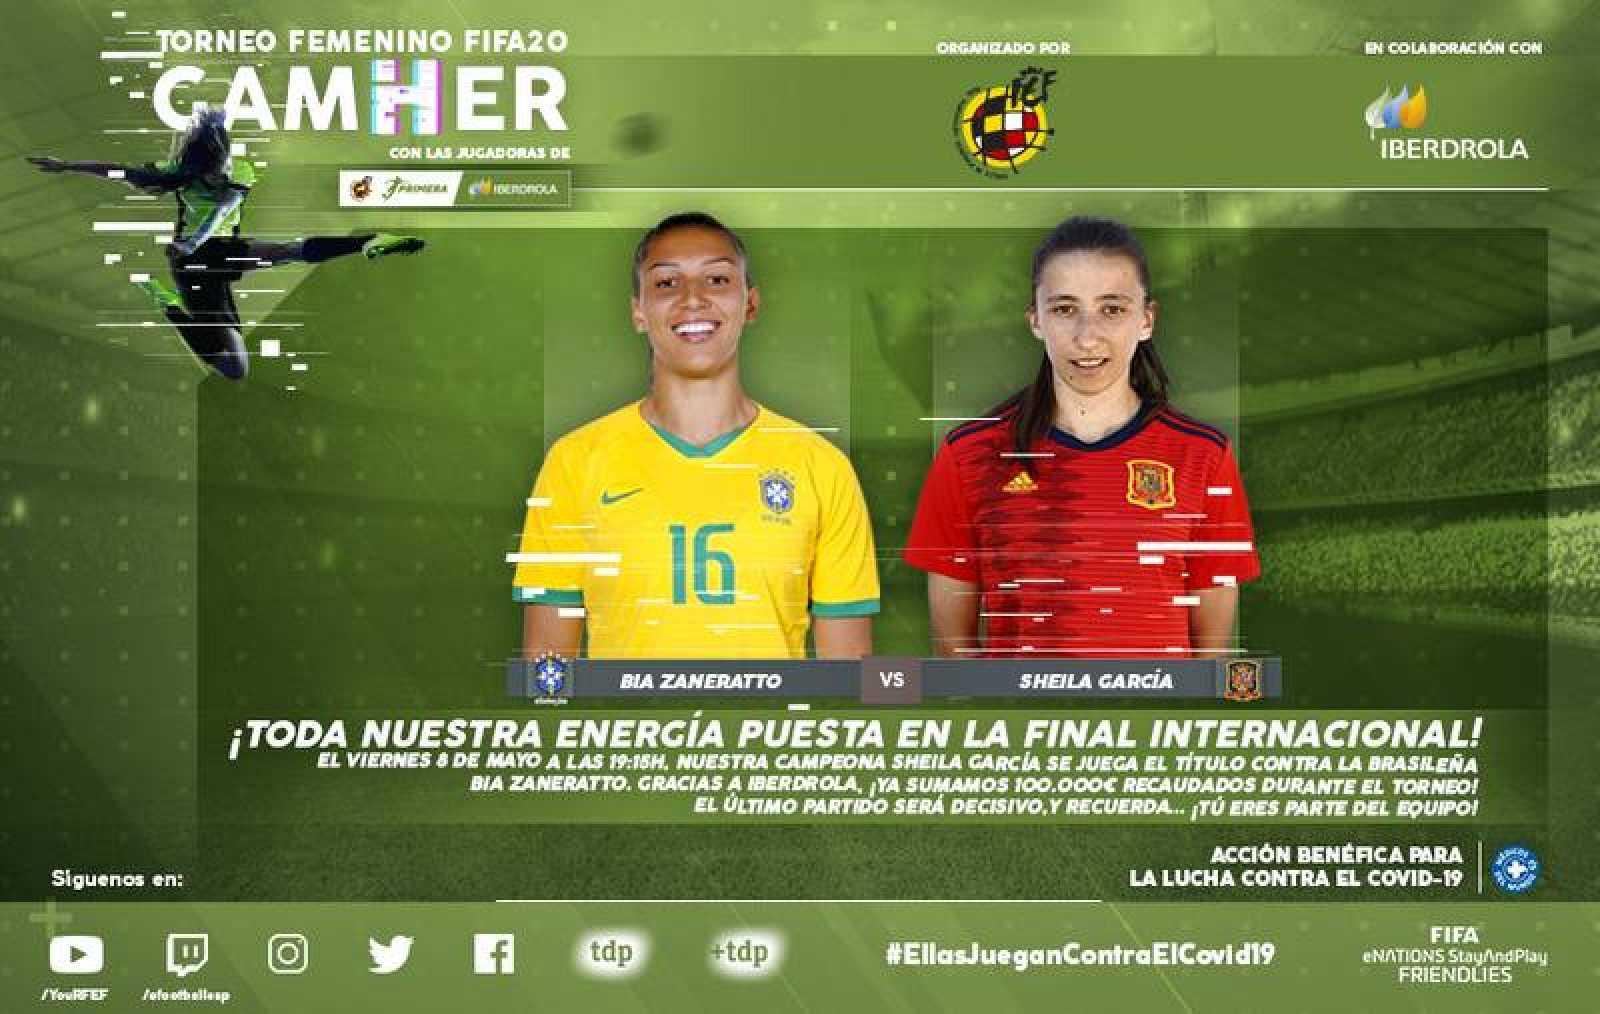 Cartel anunciador de la final del GamHer